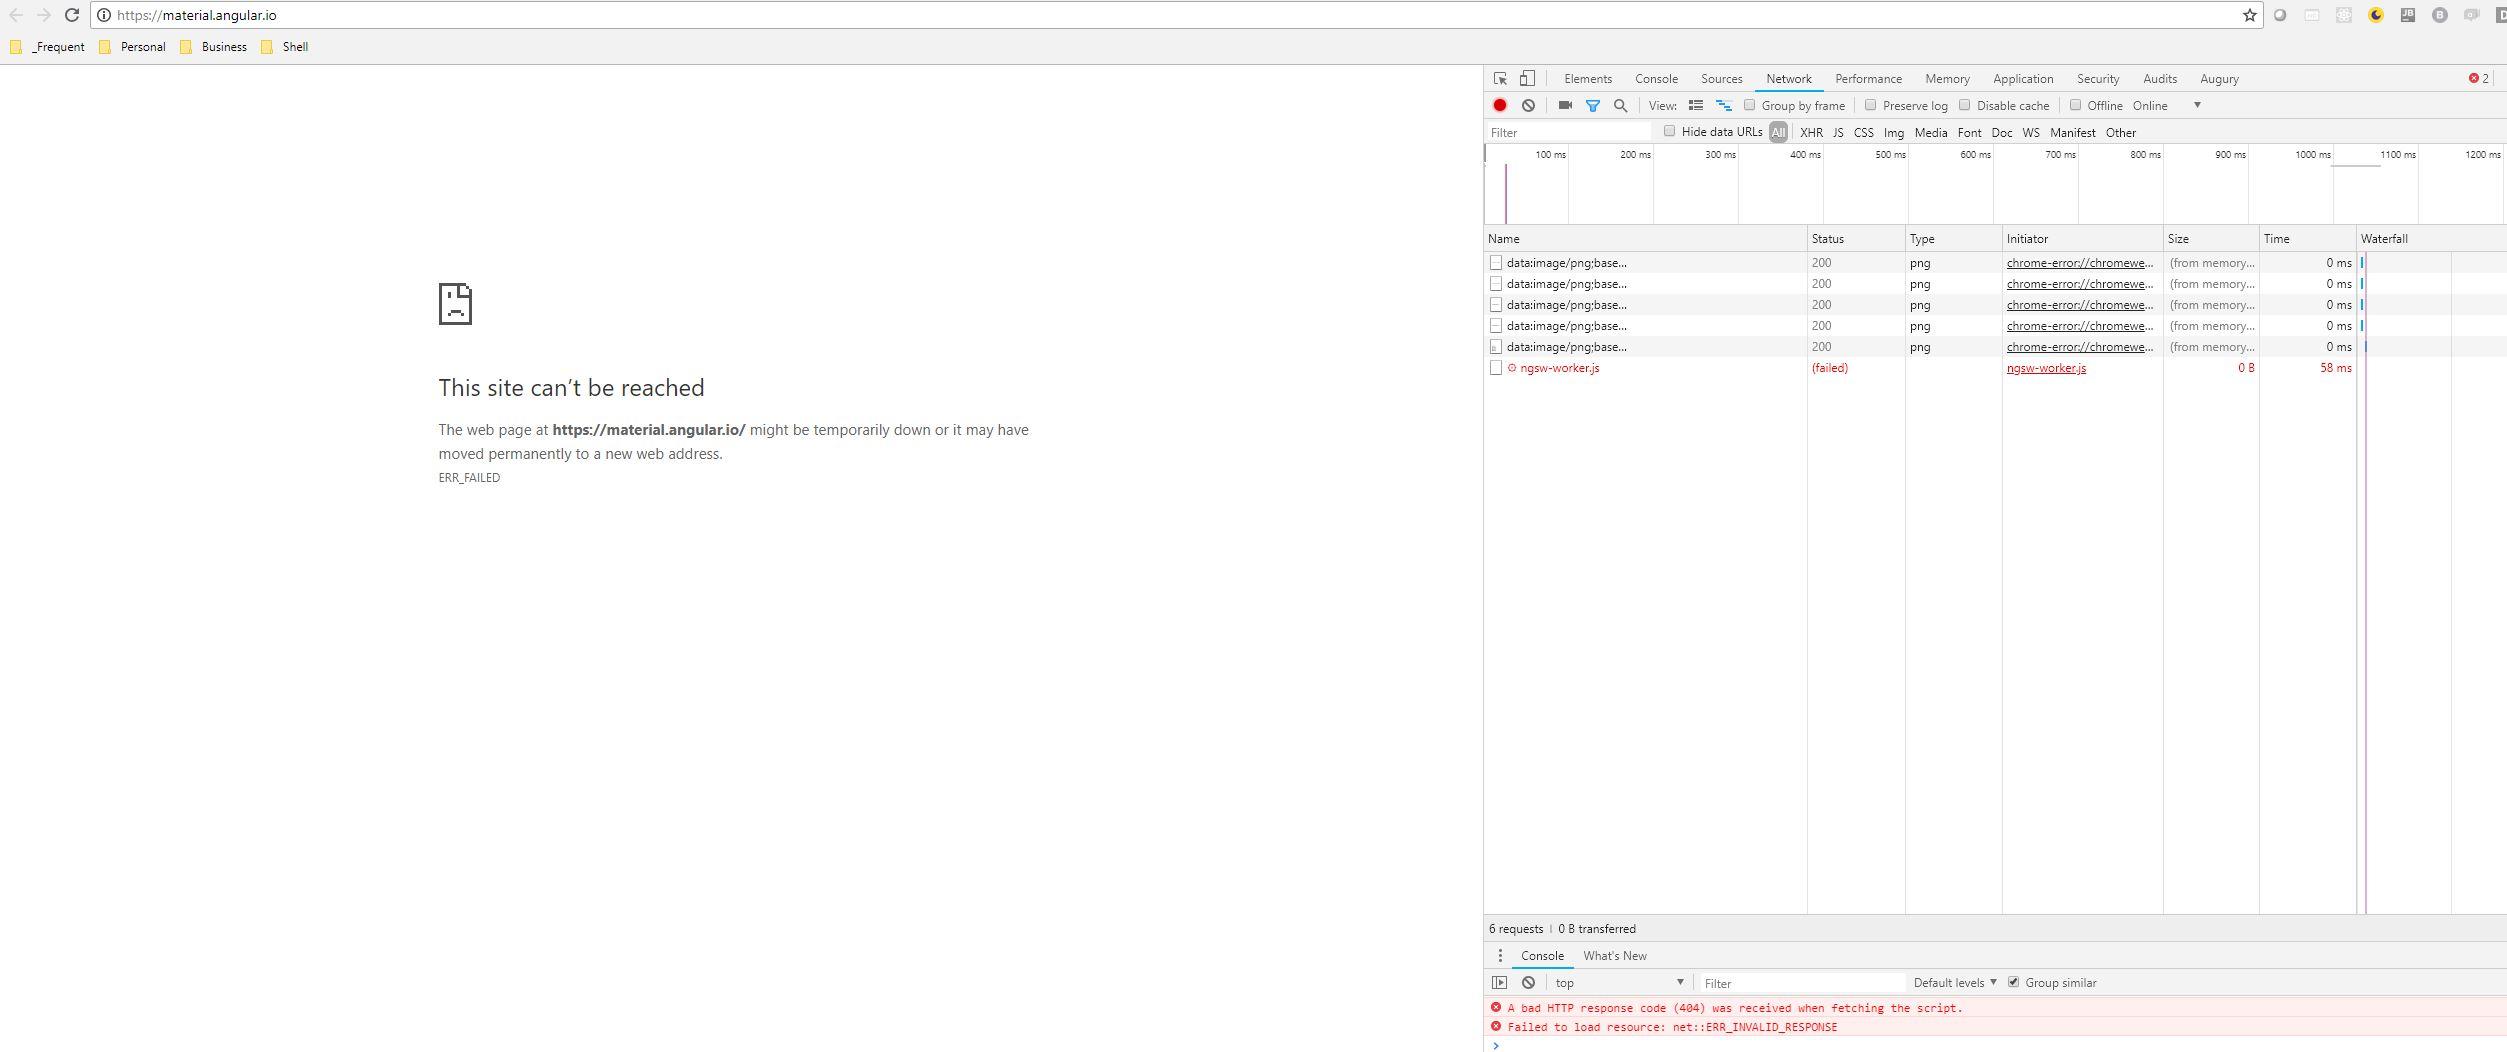 material angular io site returns error - cannot load it · Issue